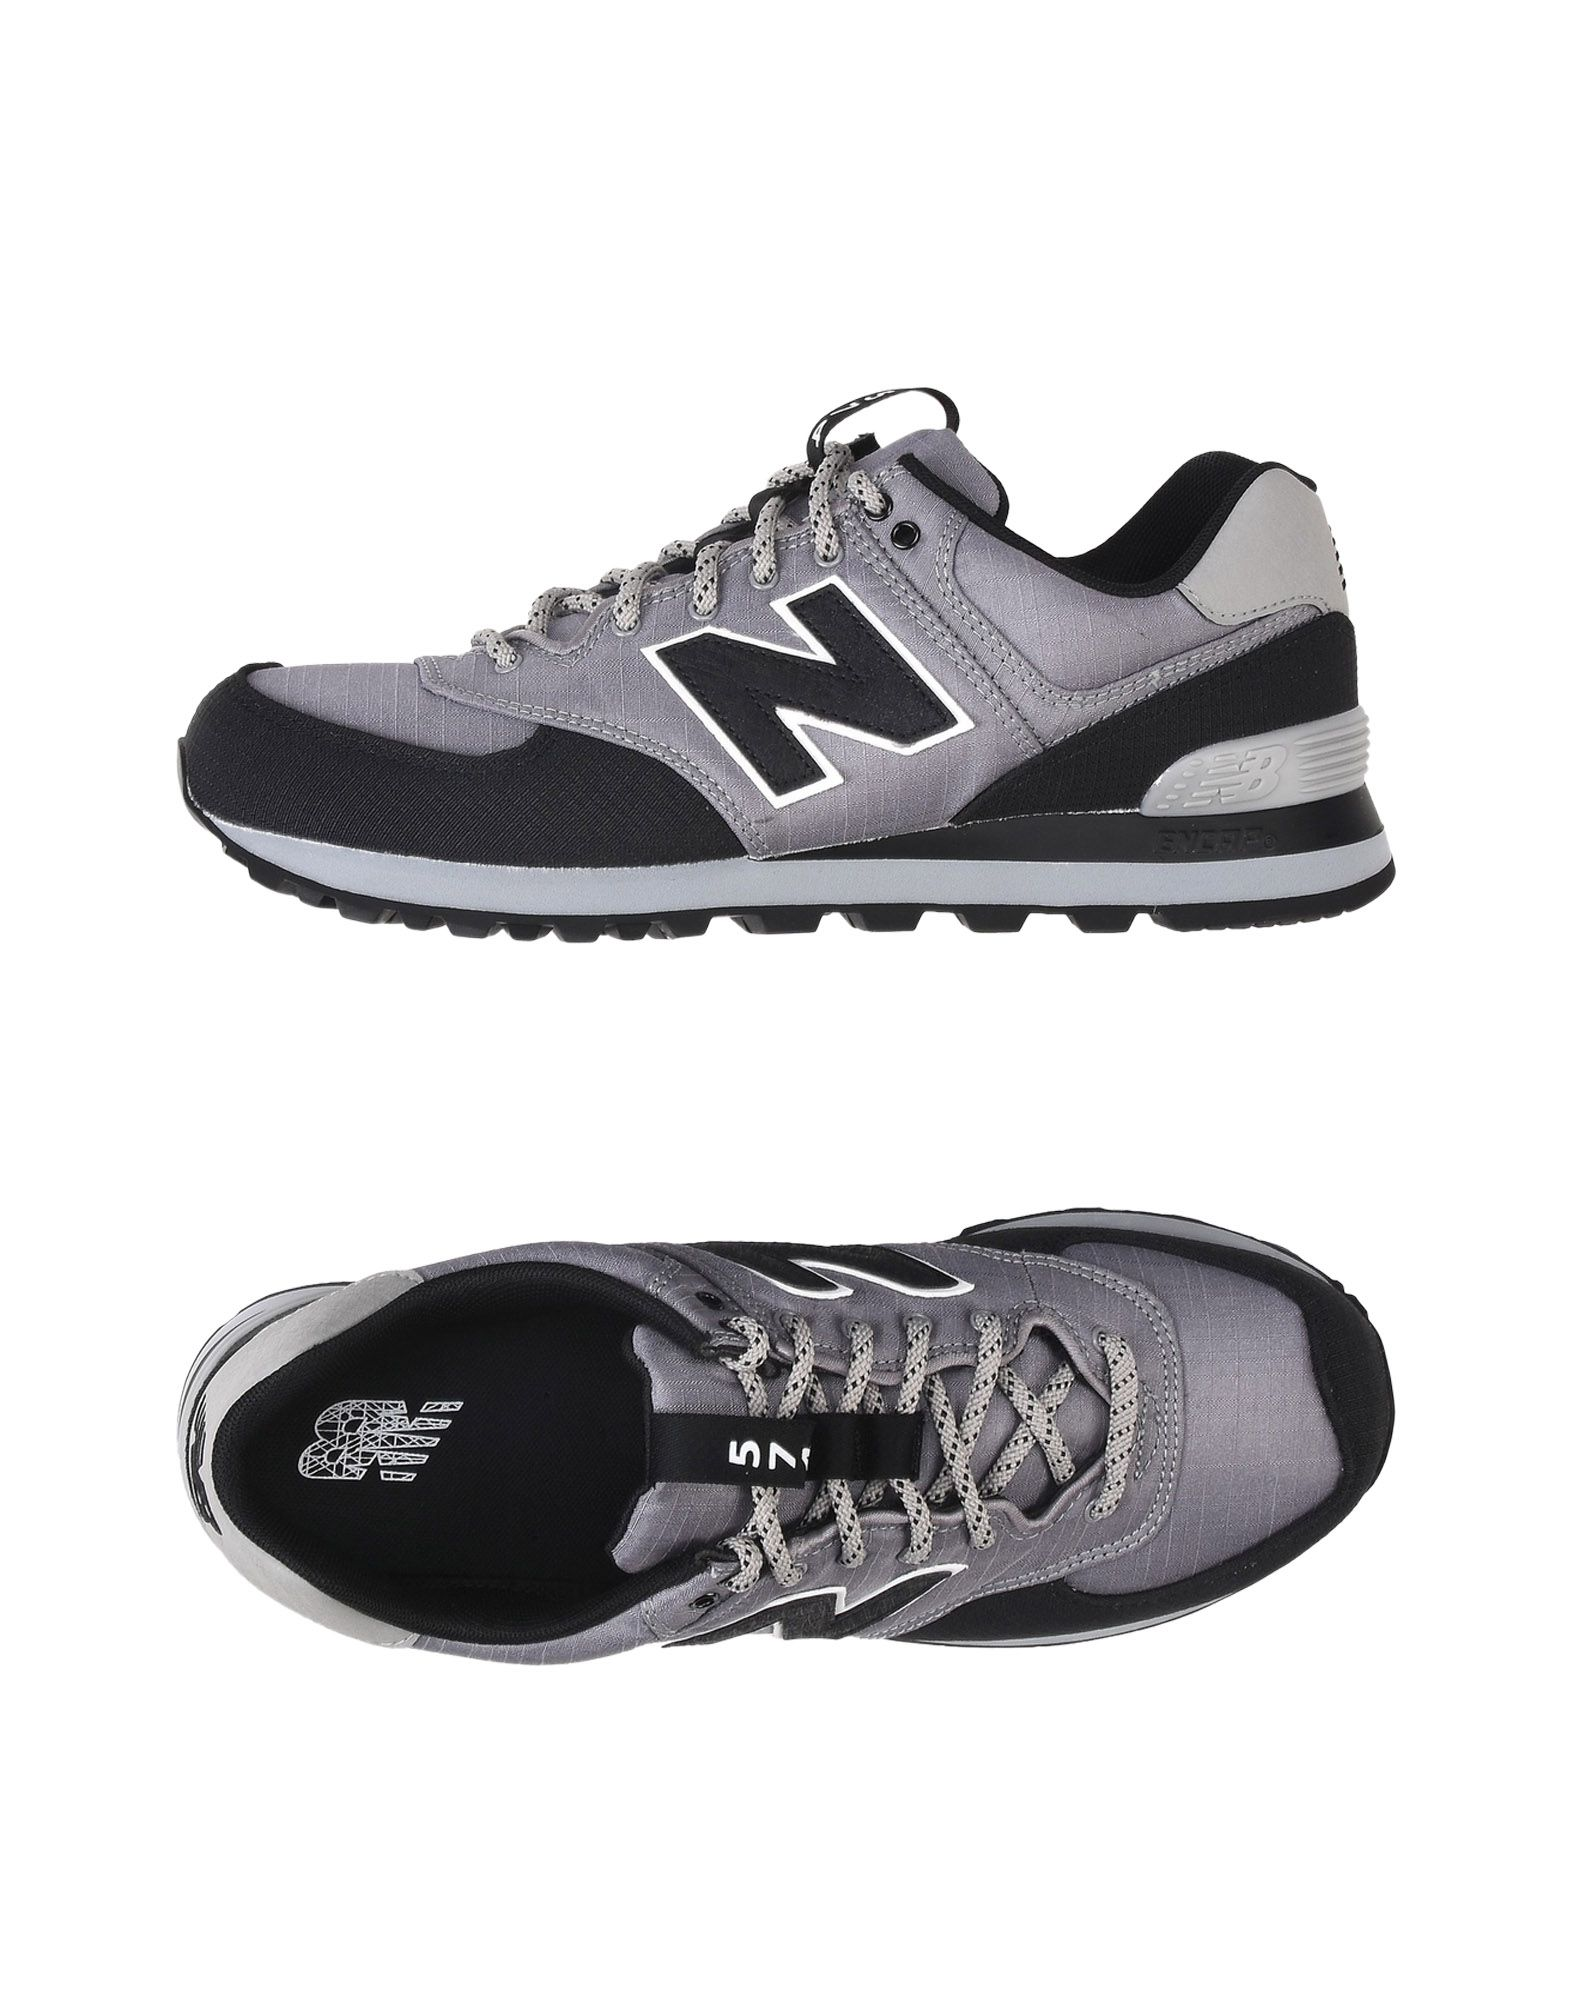 Sneakers New Balance 574 Ripstop Outdoor - Uomo - 11393099CG